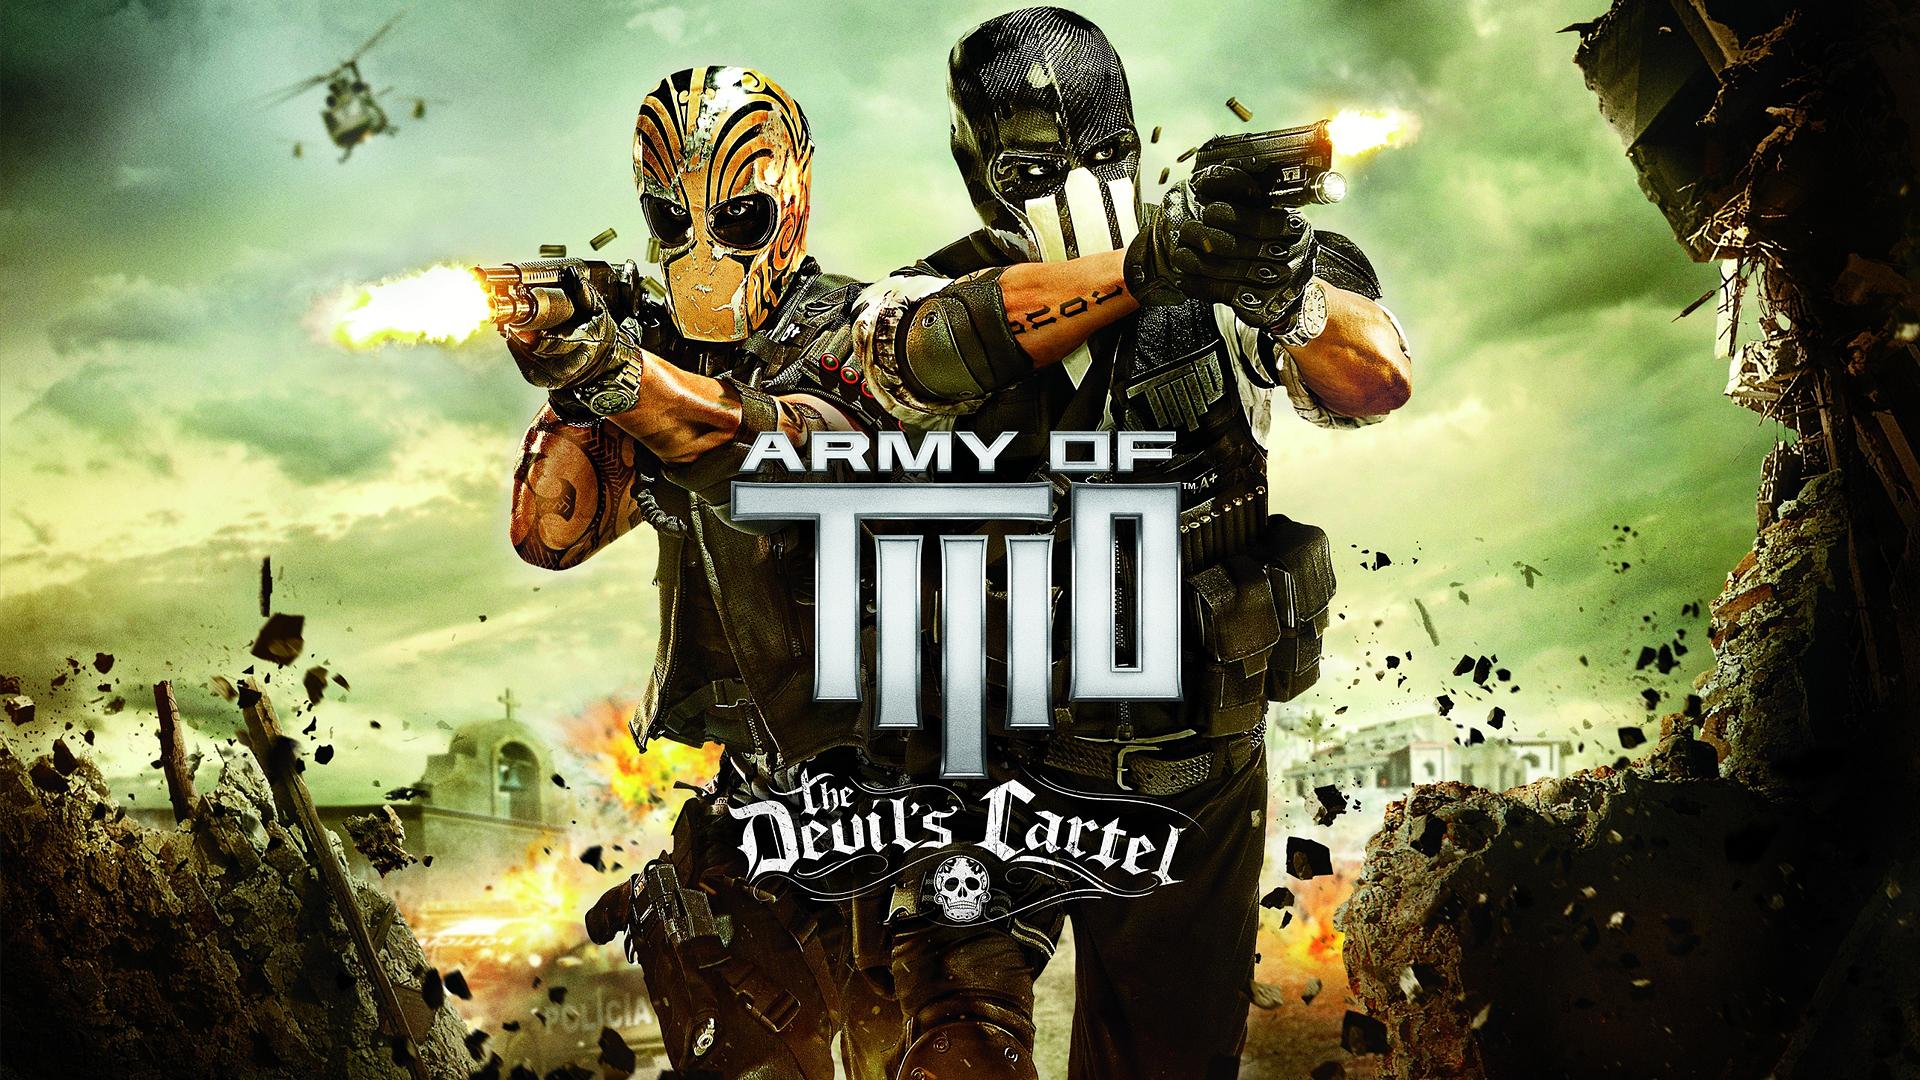 Army_of_Two_Devil's_Cartel_Splash